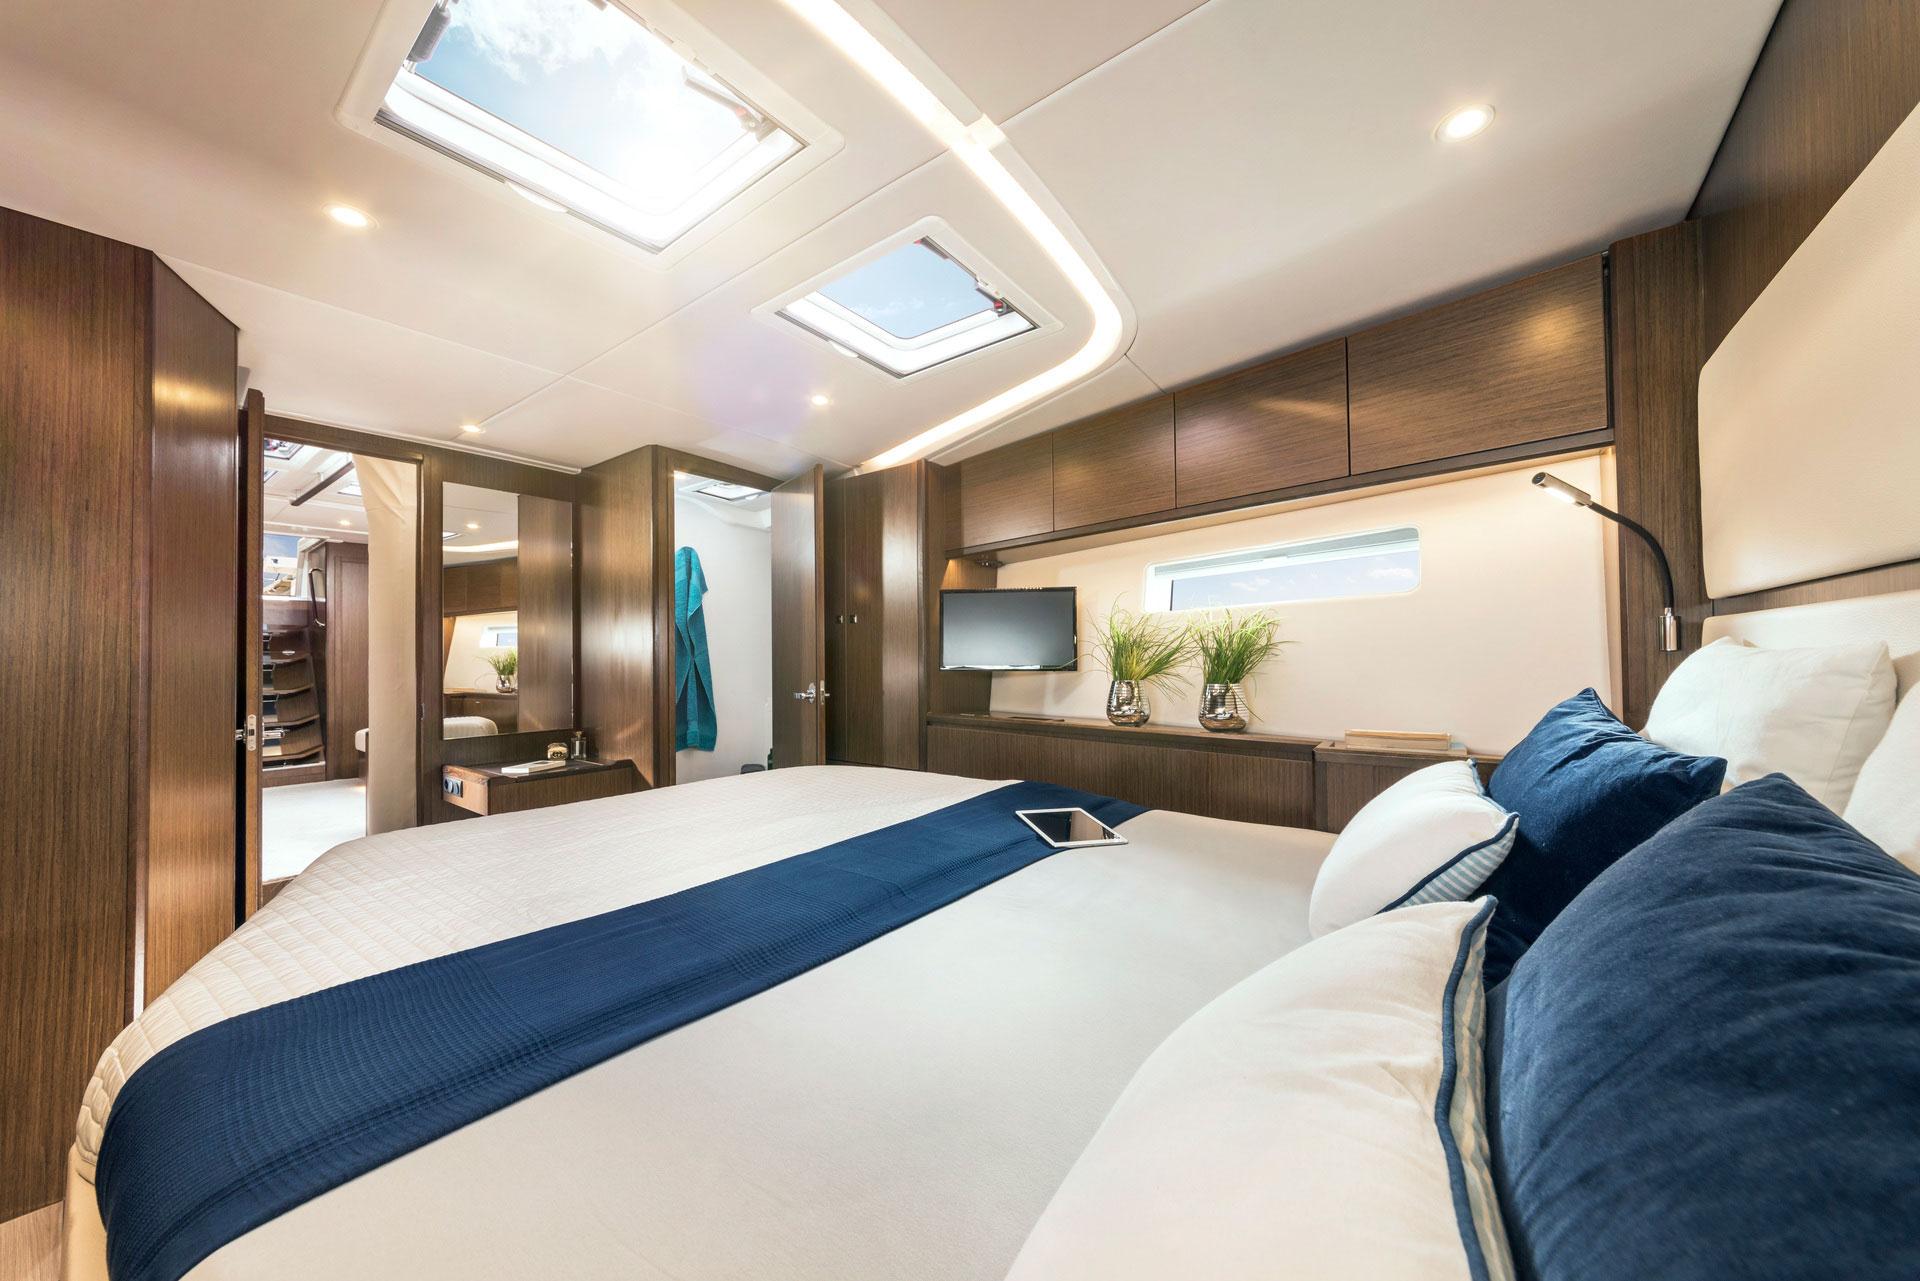 New Bavaria C57 Boats for Sale - Interior